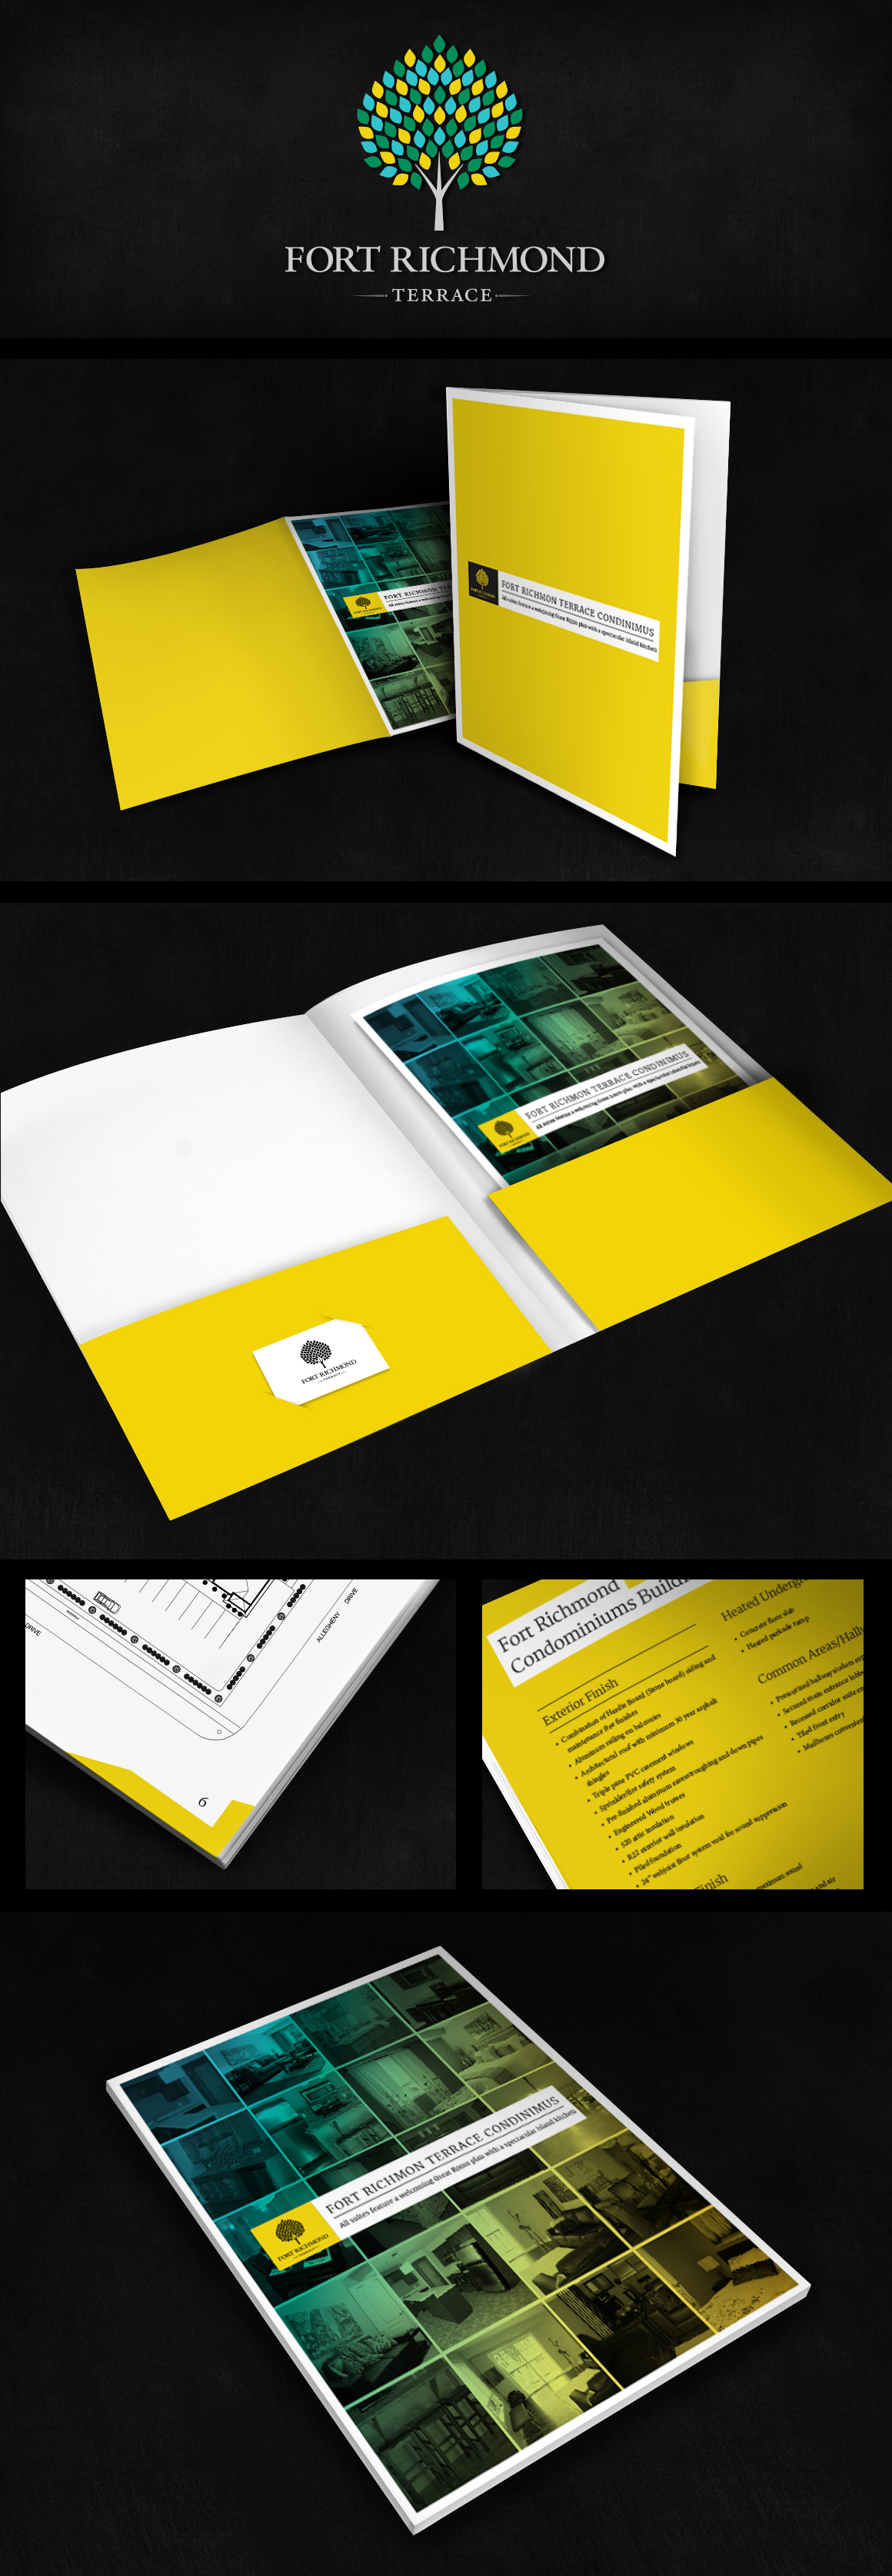 web-design-winnipeg-verda.jpg